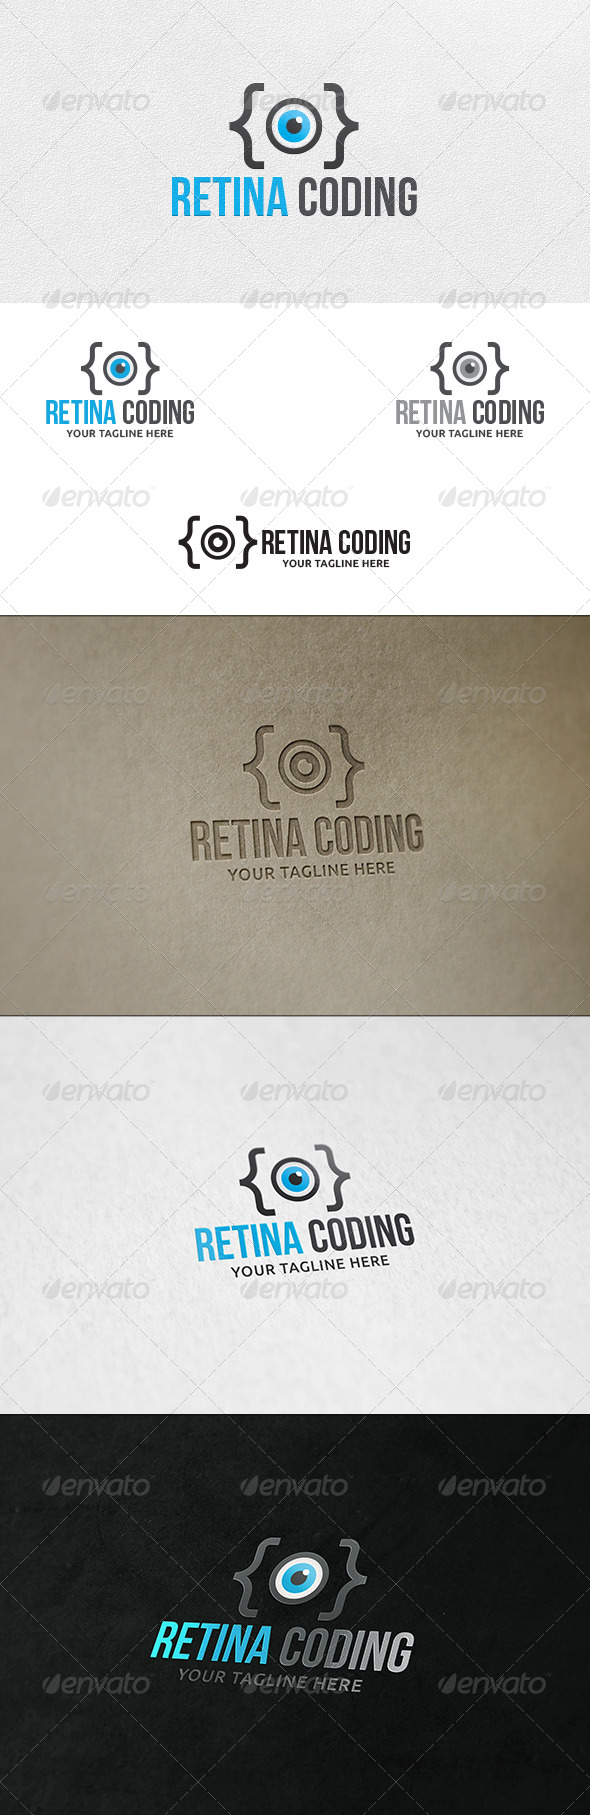 Retina Coding - Logo Template - Symbols Logo Templates